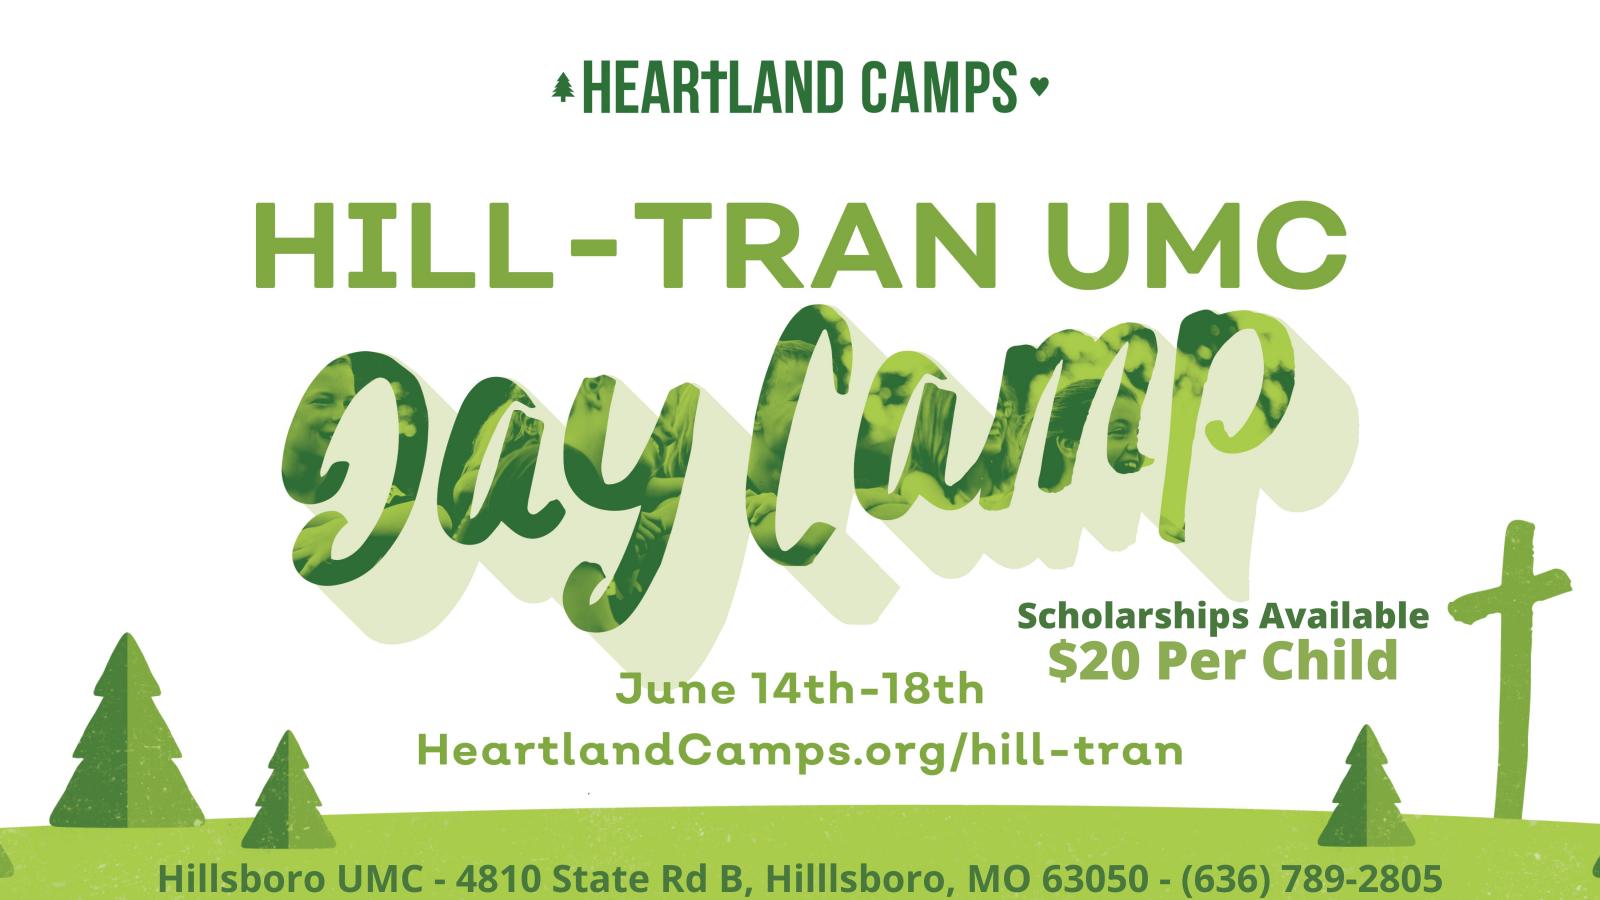 Hill-Tran FB 6000 x 3375 $20 per child Leader Ad